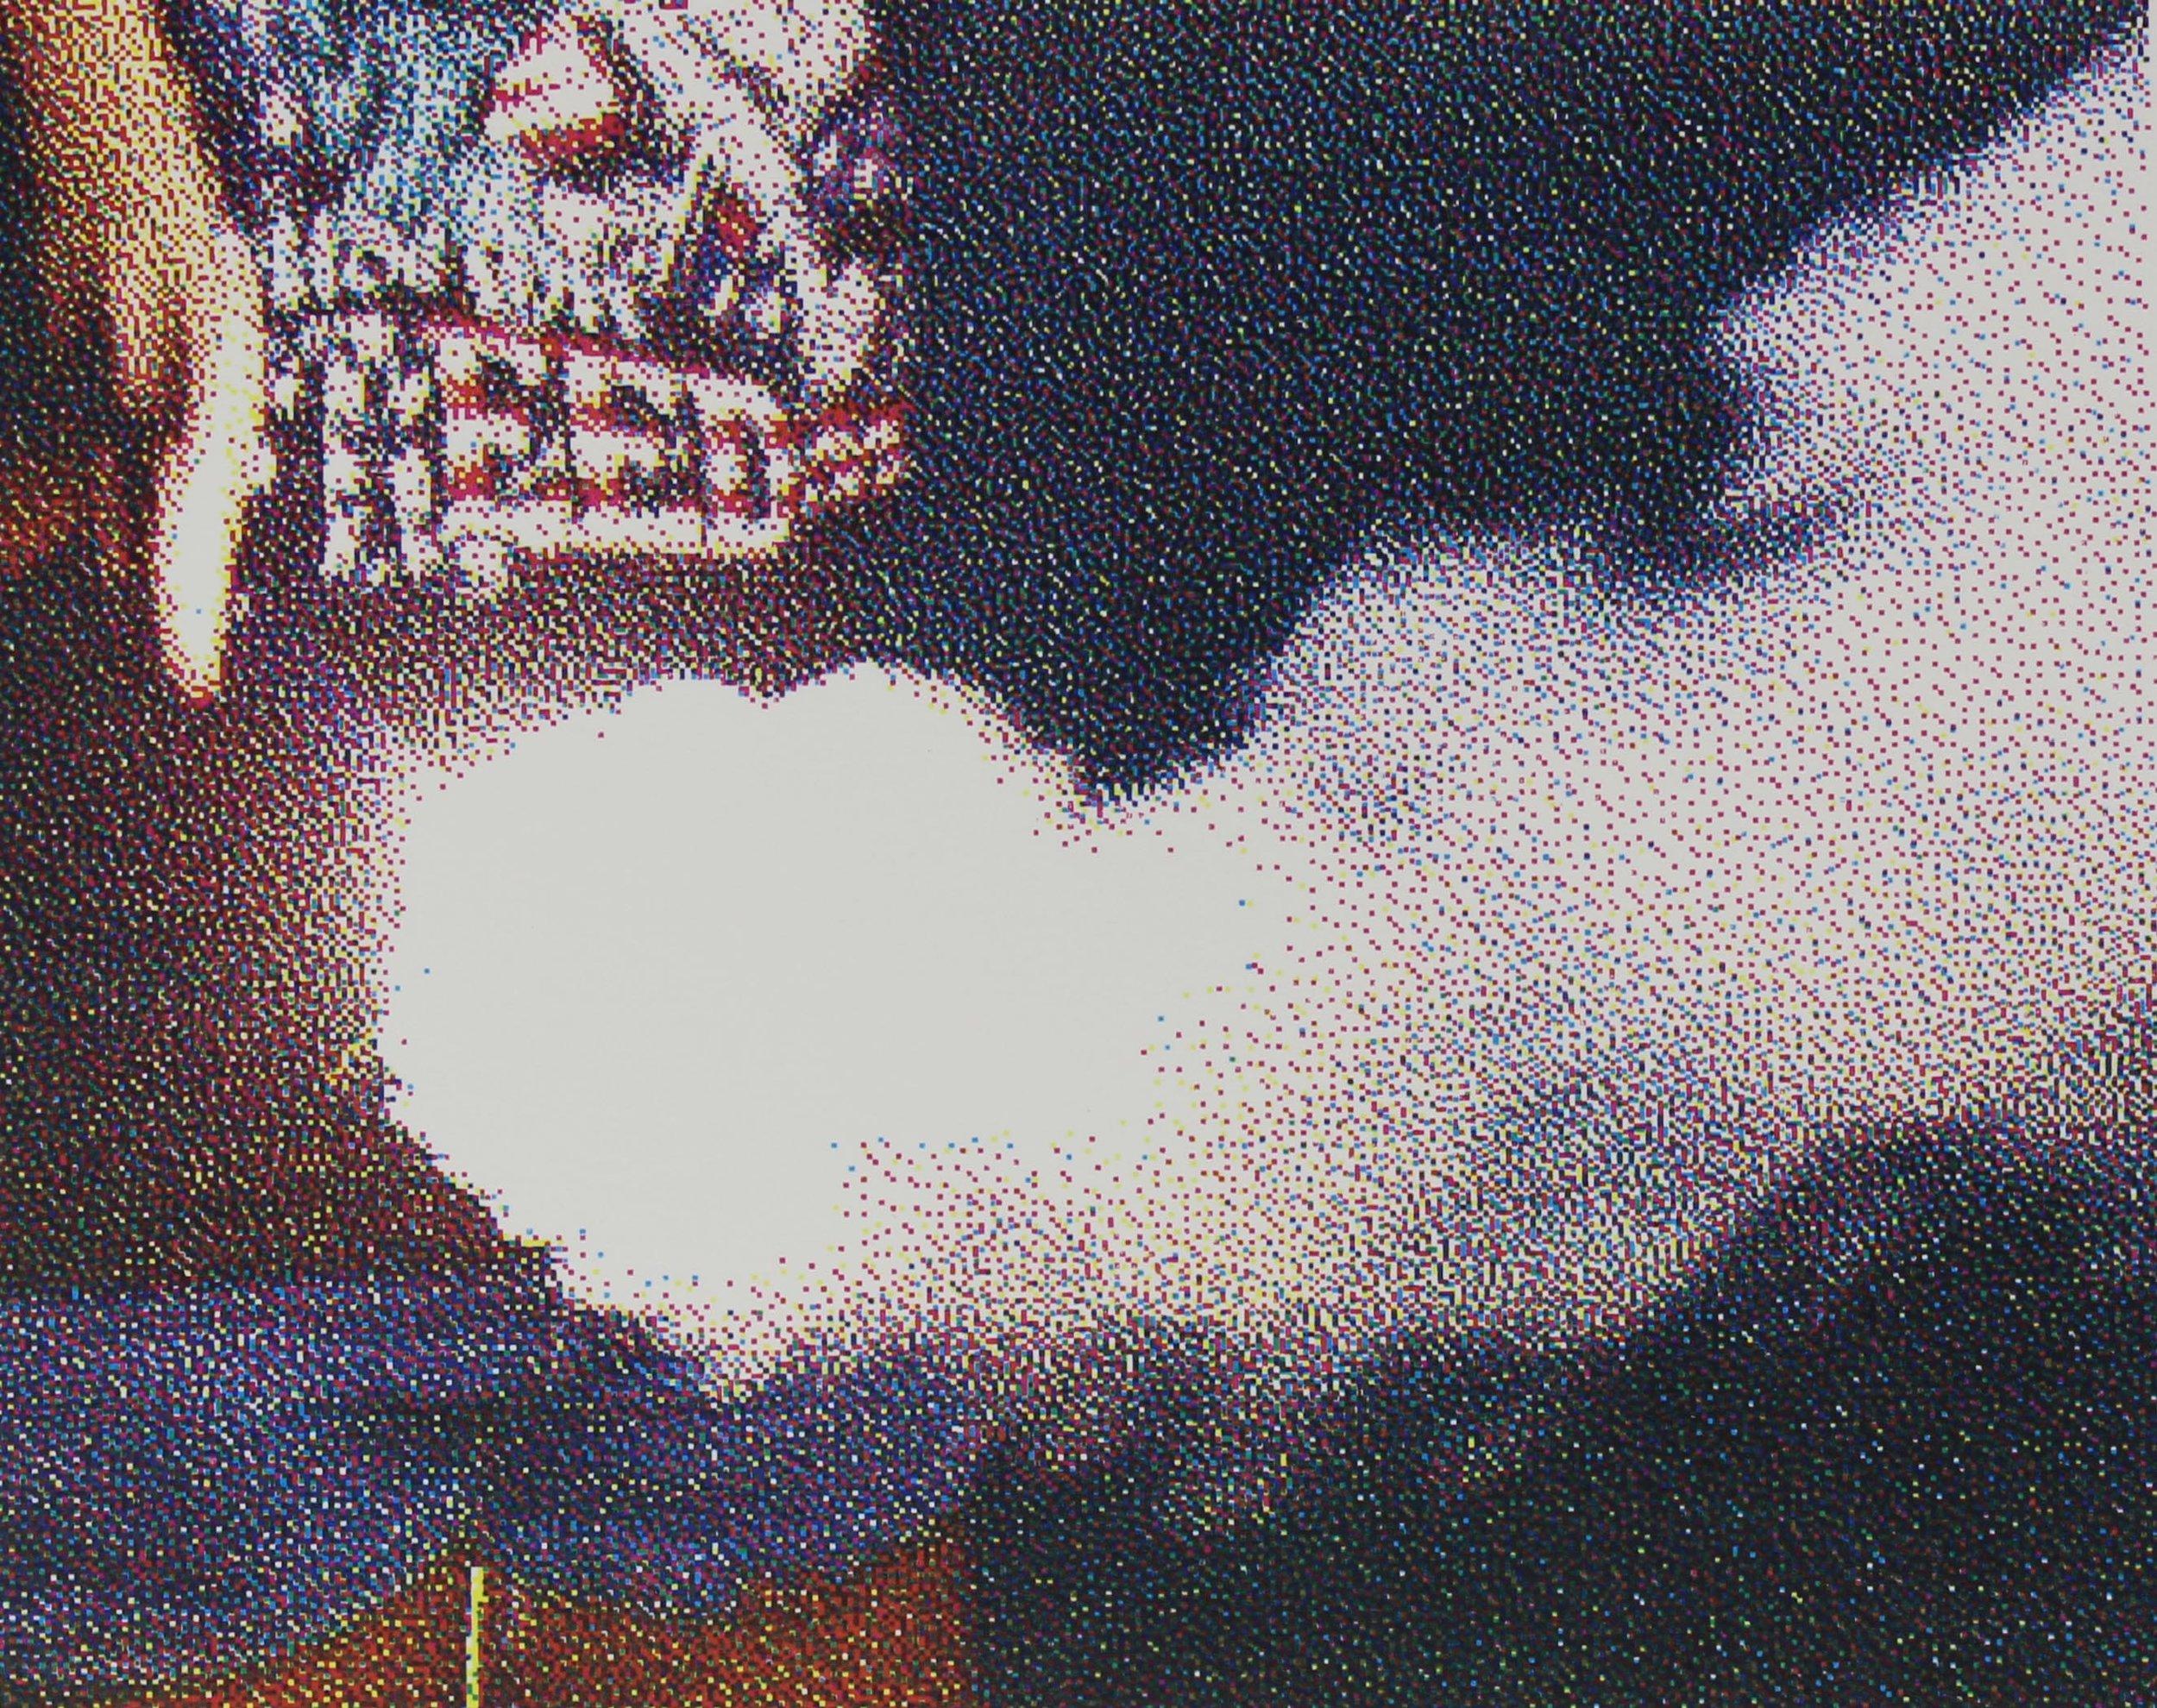 "SHOCK & AWE: Smoke  CMYK Screenprint. 8 x 10"" 2018"